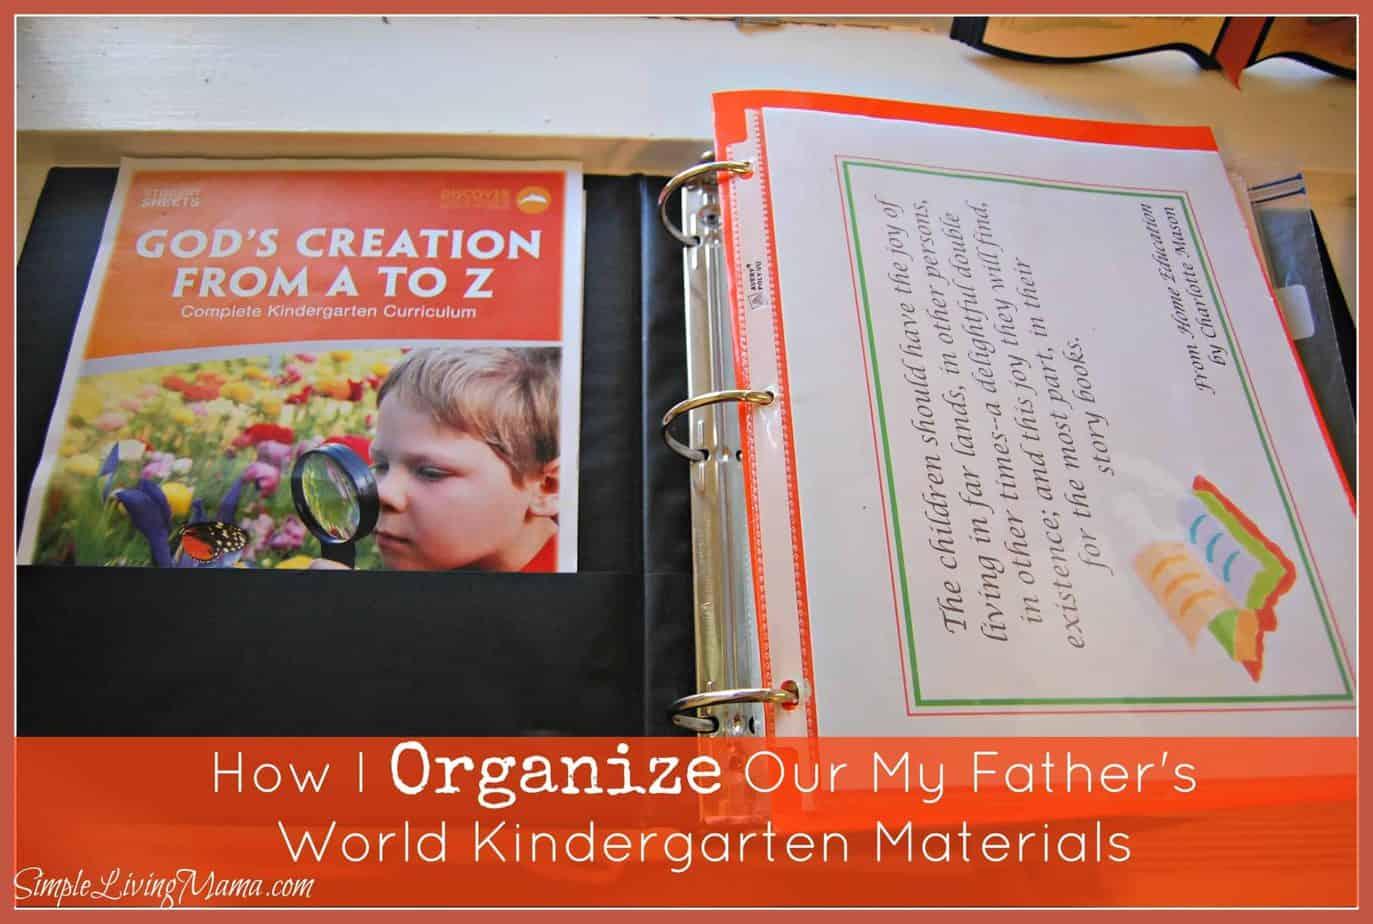 How To Organize My Father's World Kindergarten Curriculum Materials